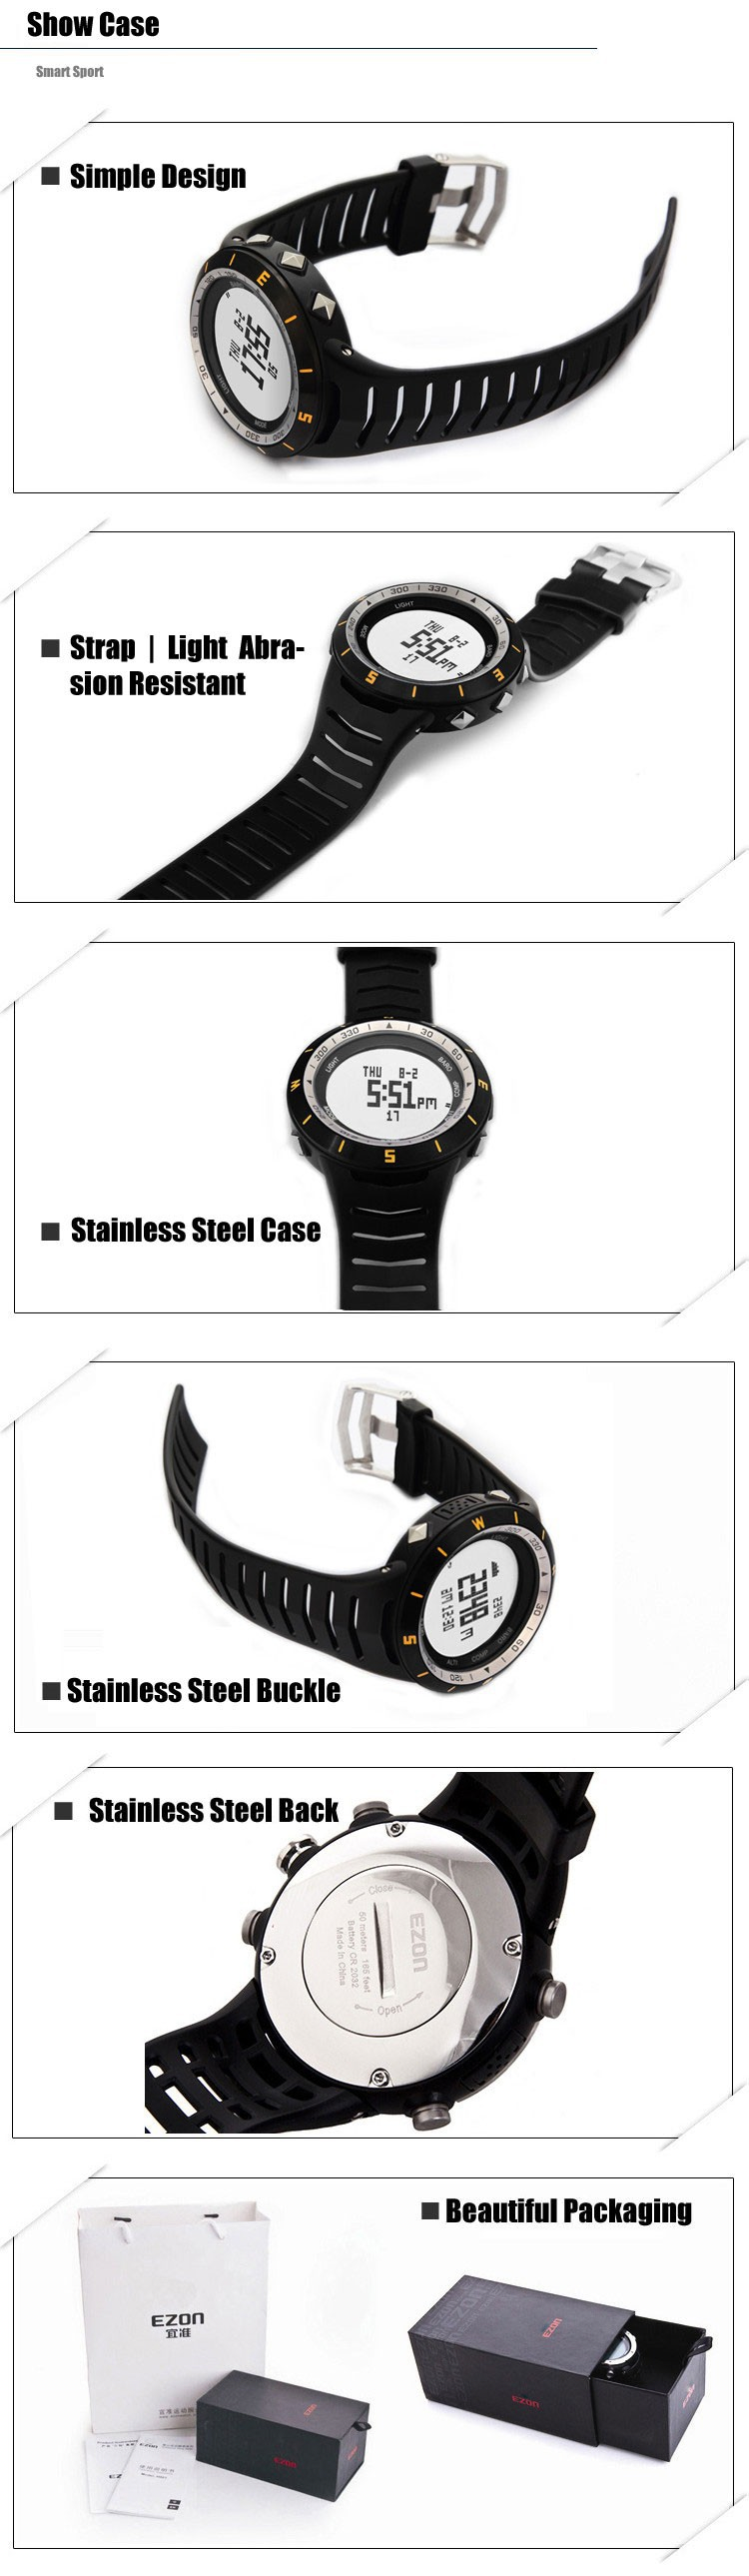 ezon watch H005A11 Men's outdoor sports climbing Waterproof watches watches